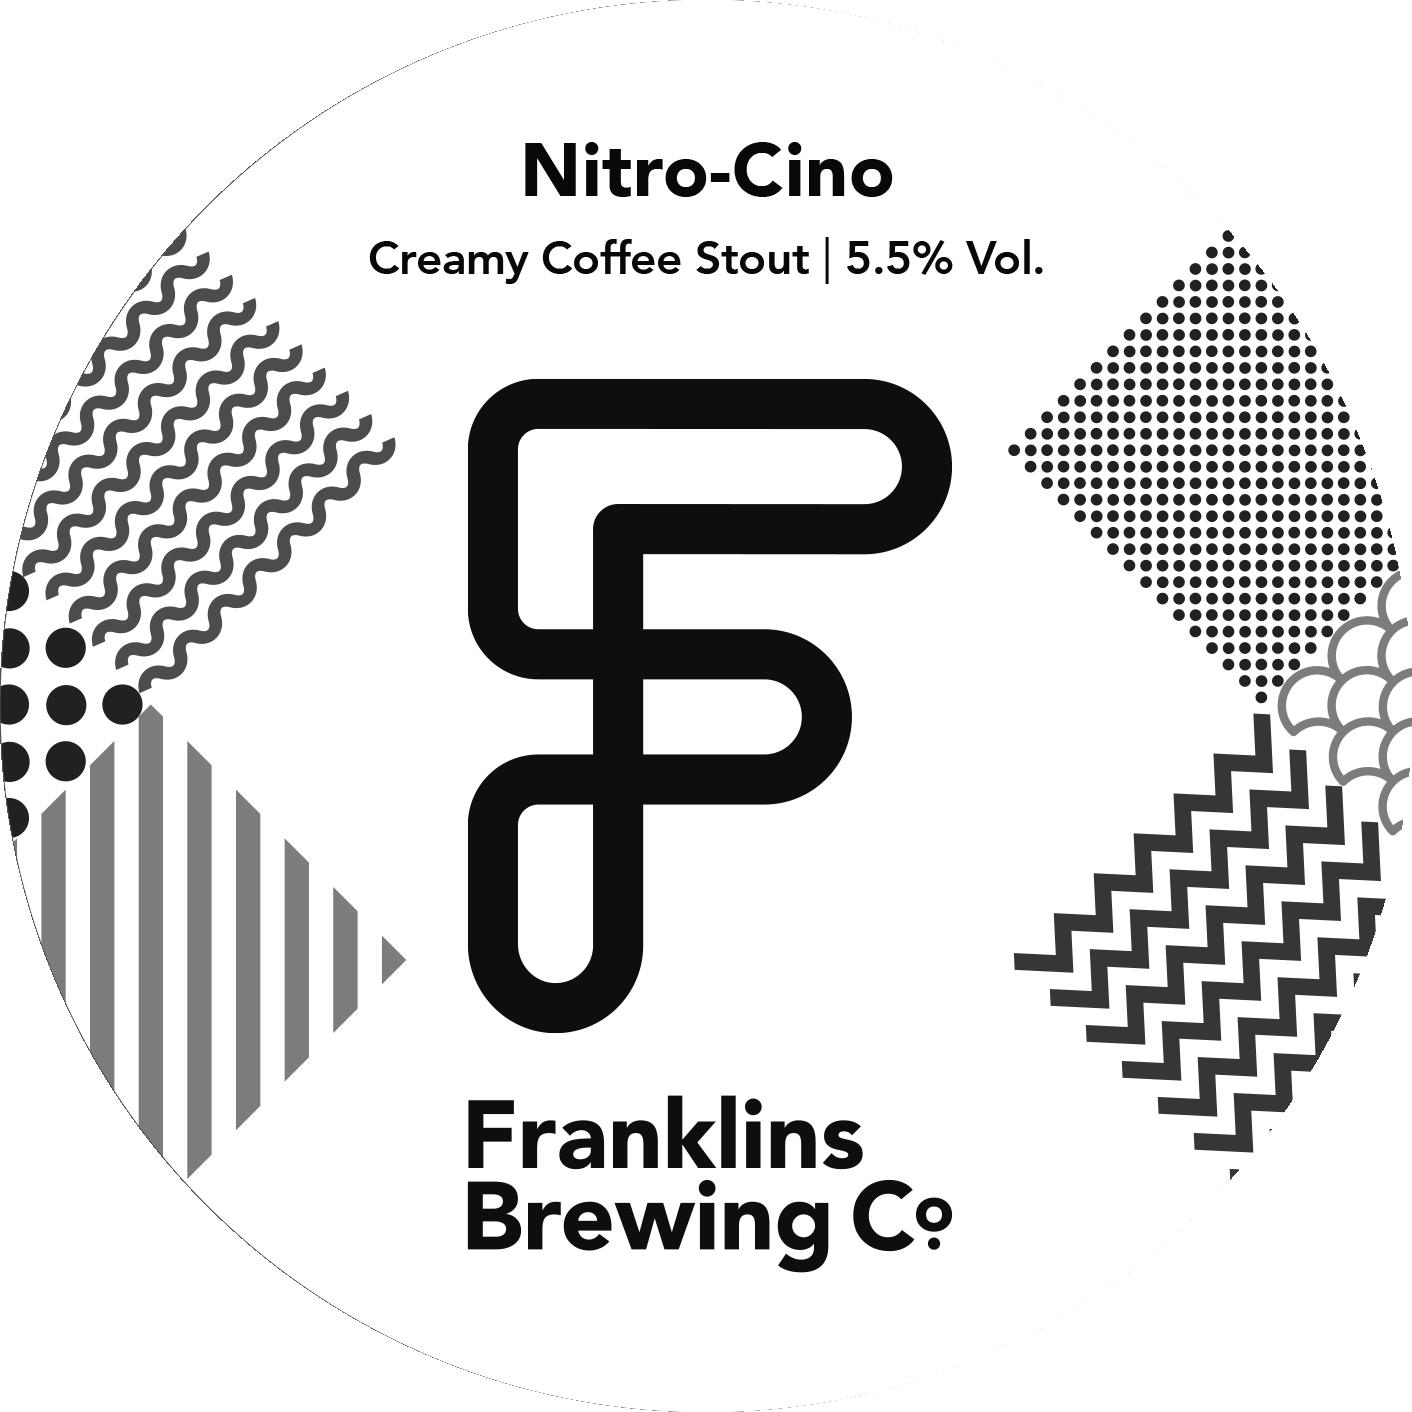 Franklins-Brewing-Co-Nitro-Cino-Keg-Clip.png